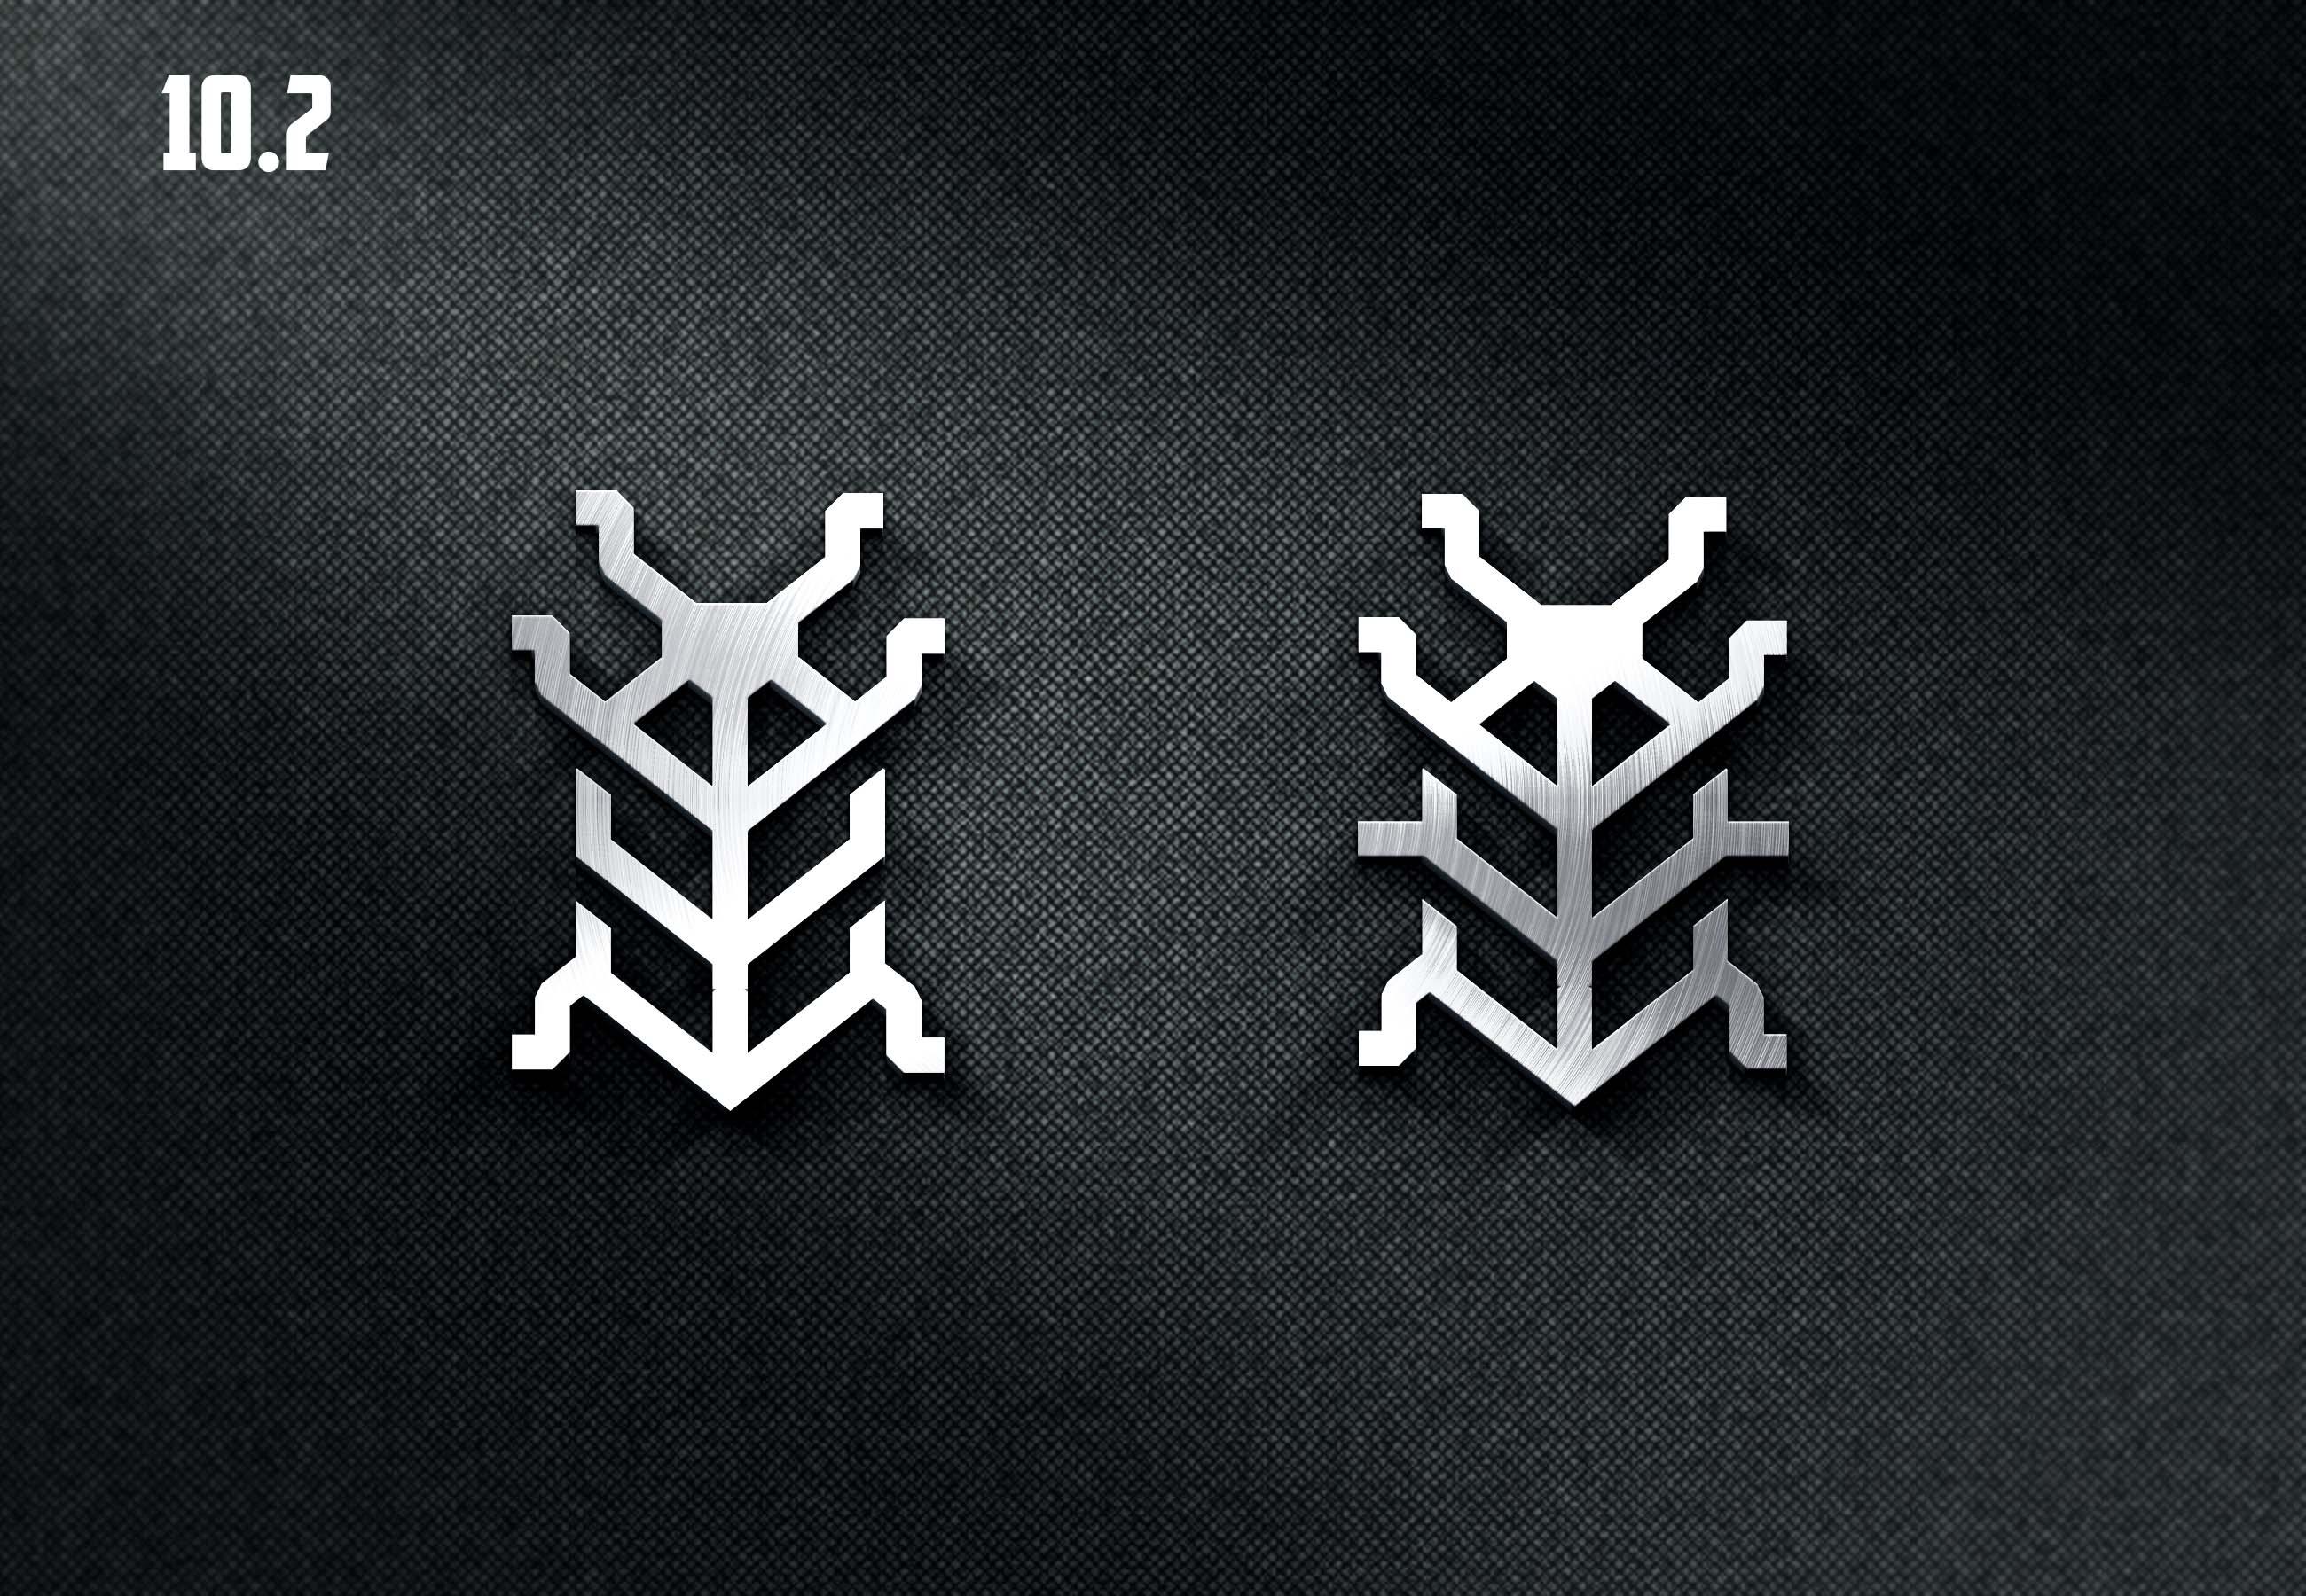 Нужен логотип (эмблема) для самодельного квадроцикла фото f_9715b1033c26aac7.jpg